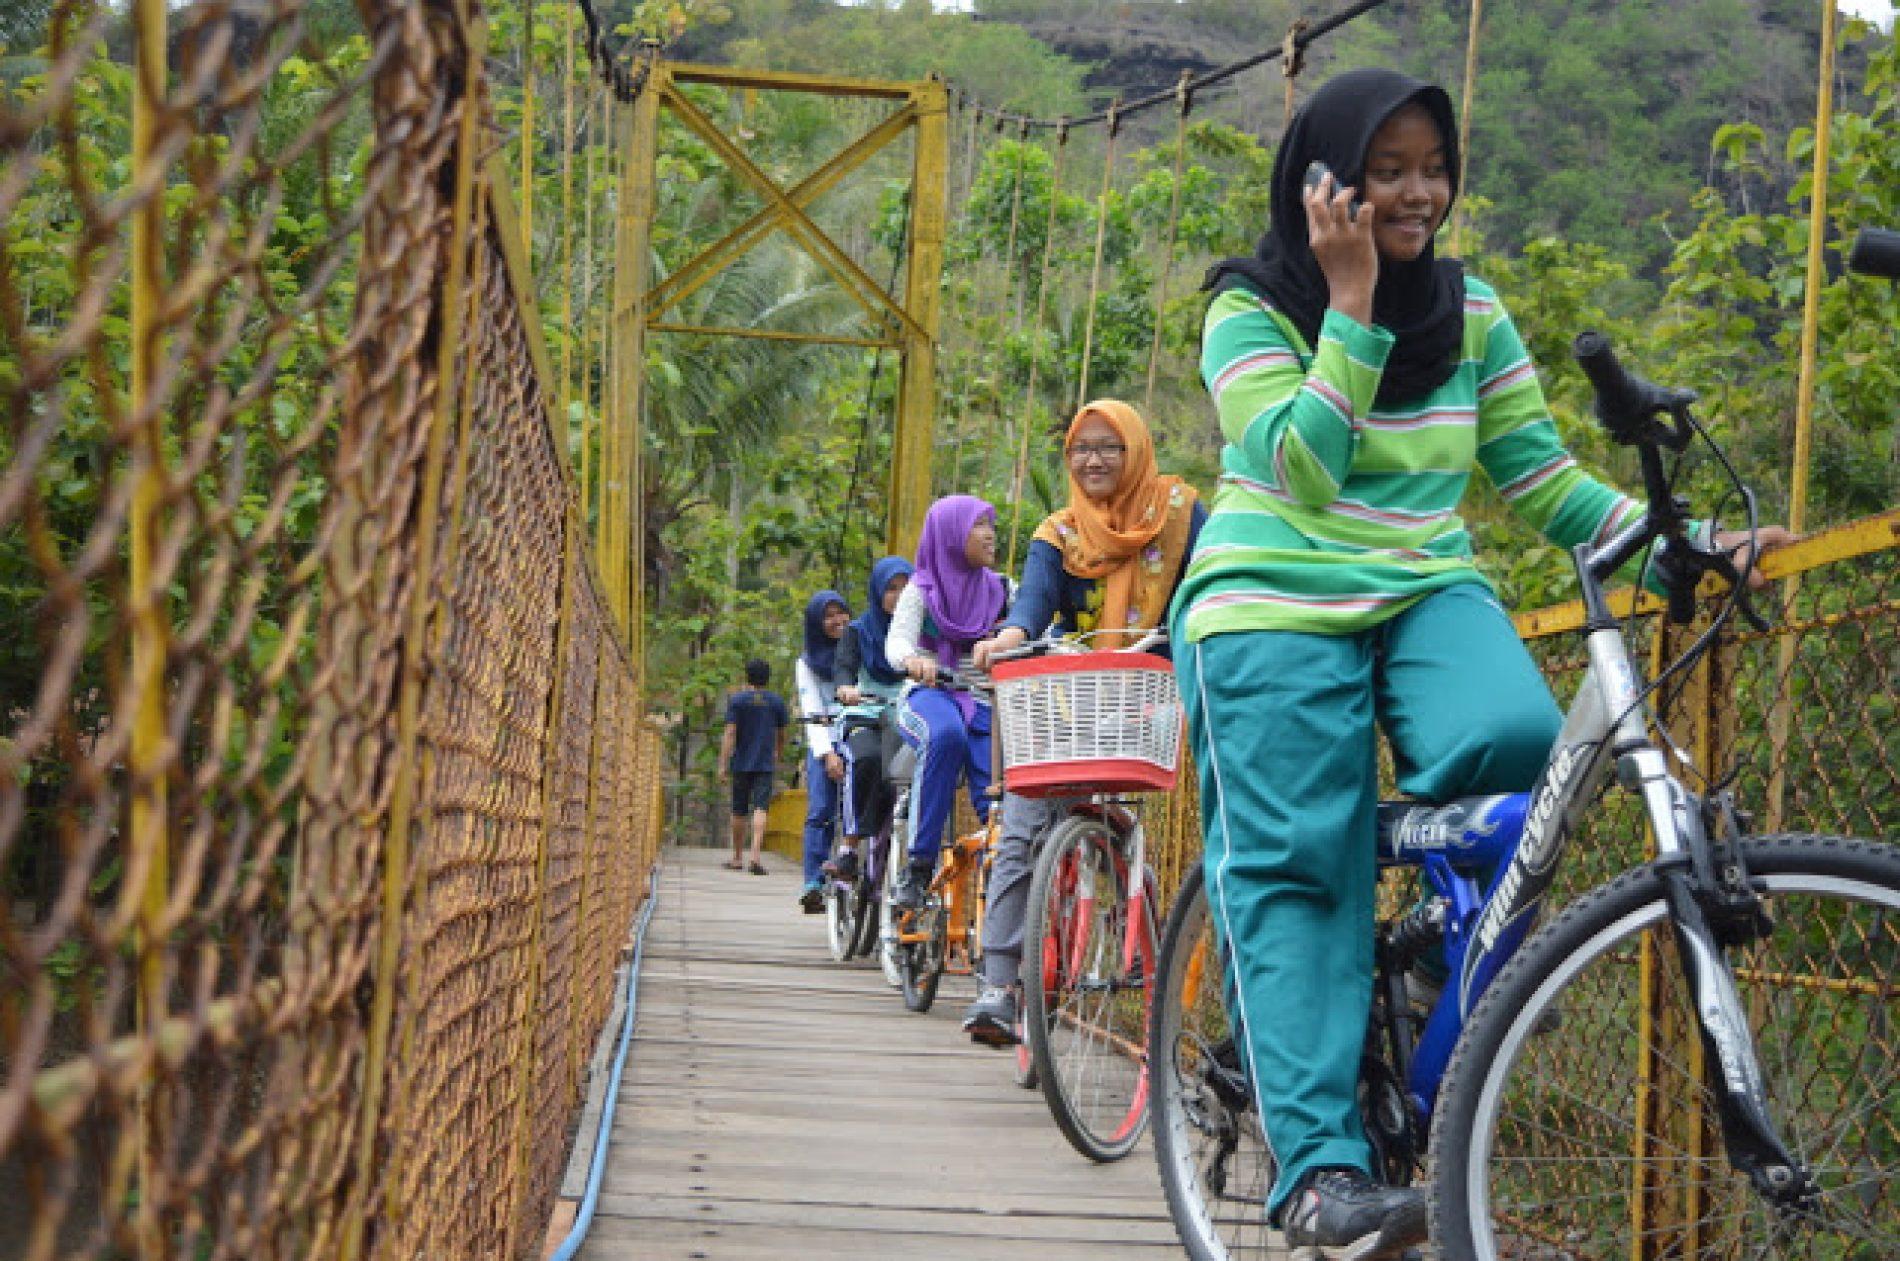 Klasik, Jembatan Kuning Selopamioro Desa Kedung Miri Imogiri